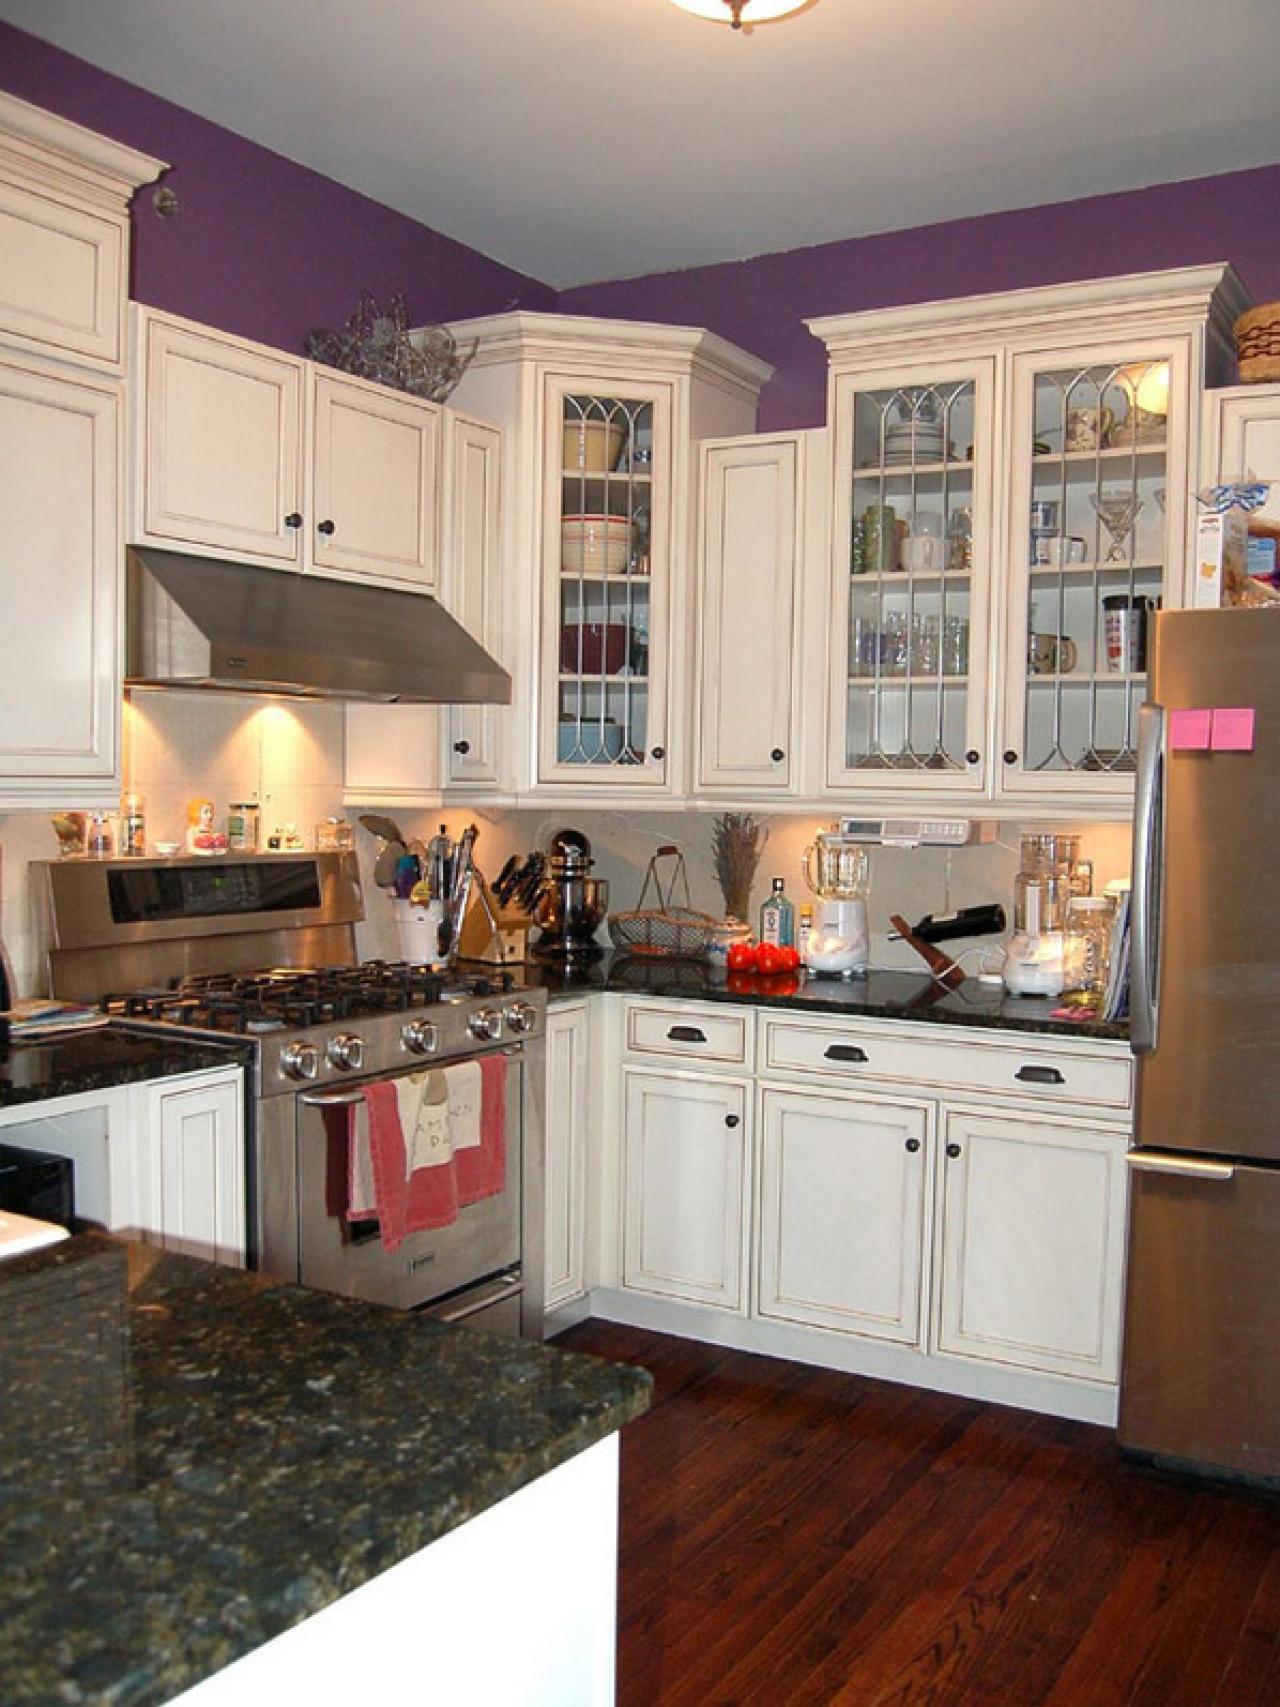 original_kitchen-armoires-blanches-murs-violets_s3x4-jpg-rend-hgtvcom-1280-1707